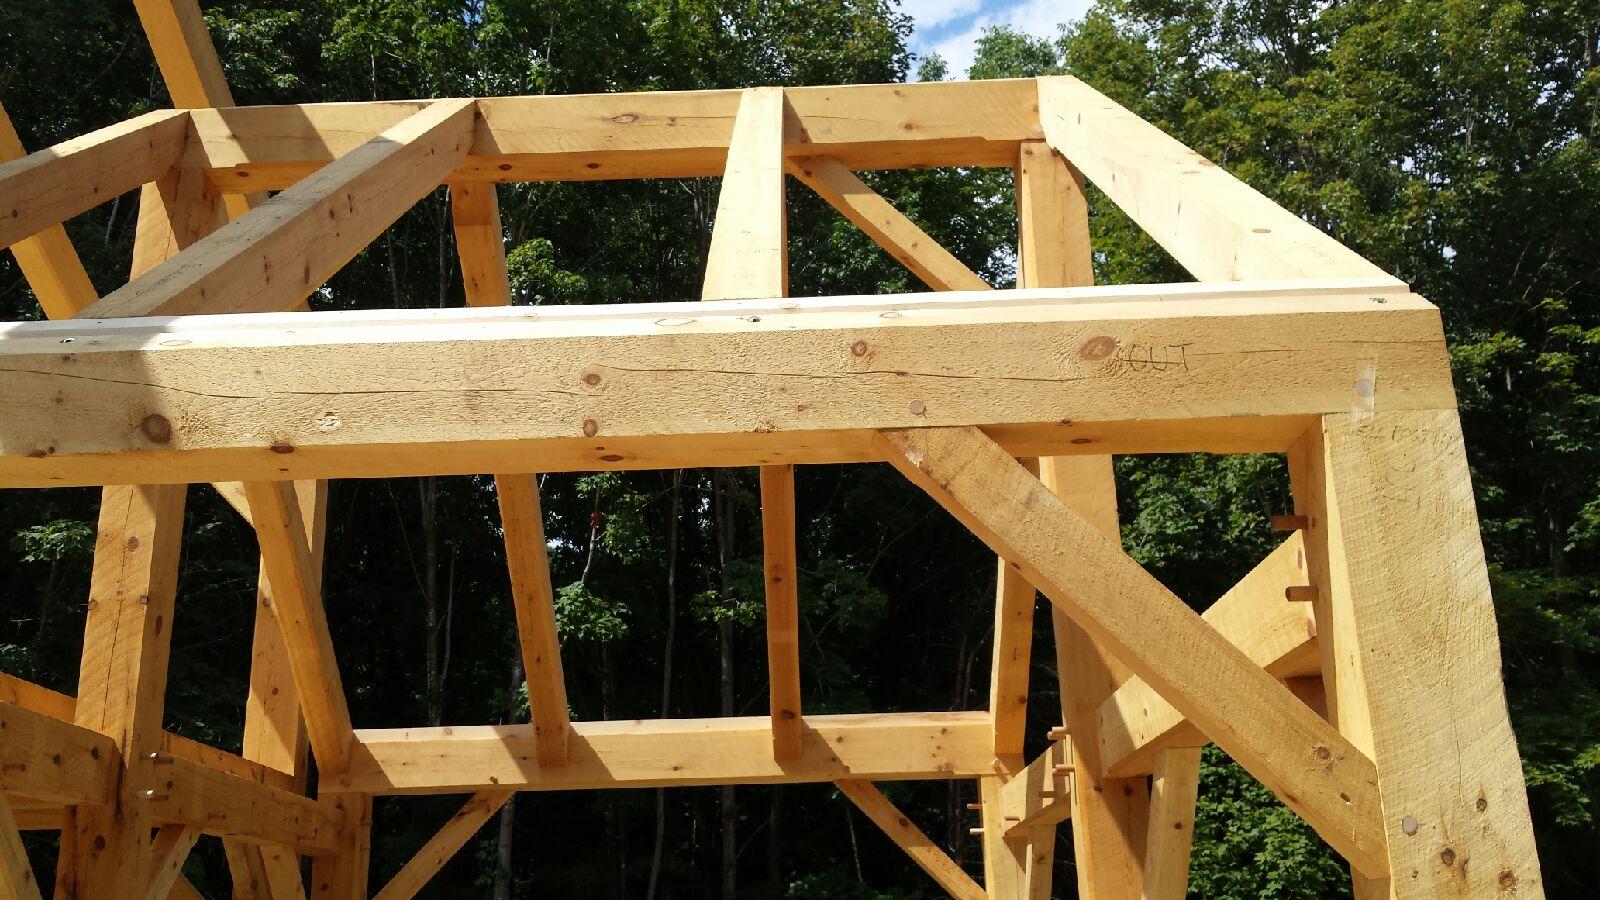 Timber Frame Houses and Barns | Custom timber frame builders